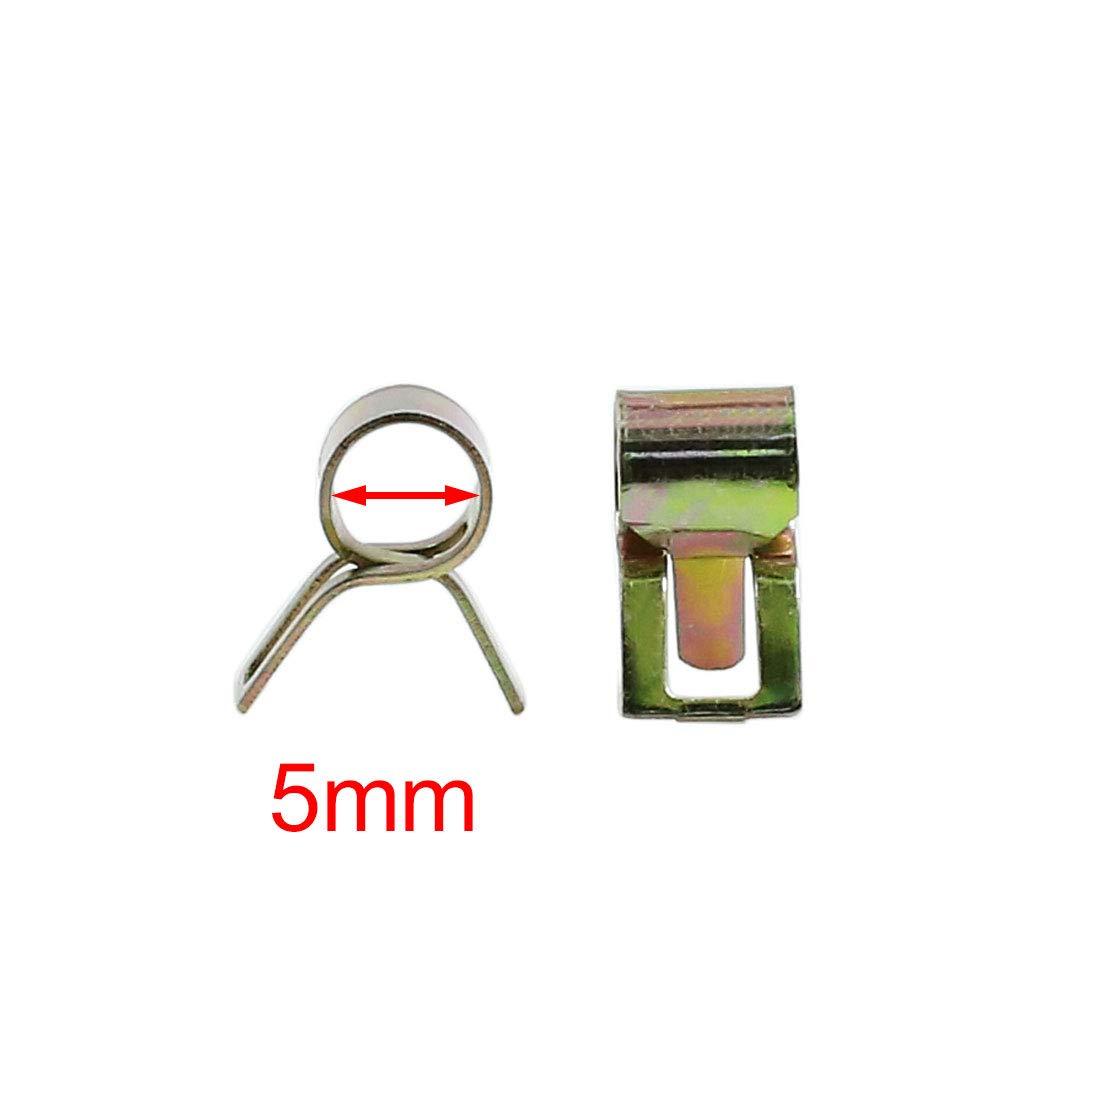 sourcing map 40pc 5mm Car Conduite air Tuyau Eau Clip Ressort Collier Fixation Flexible